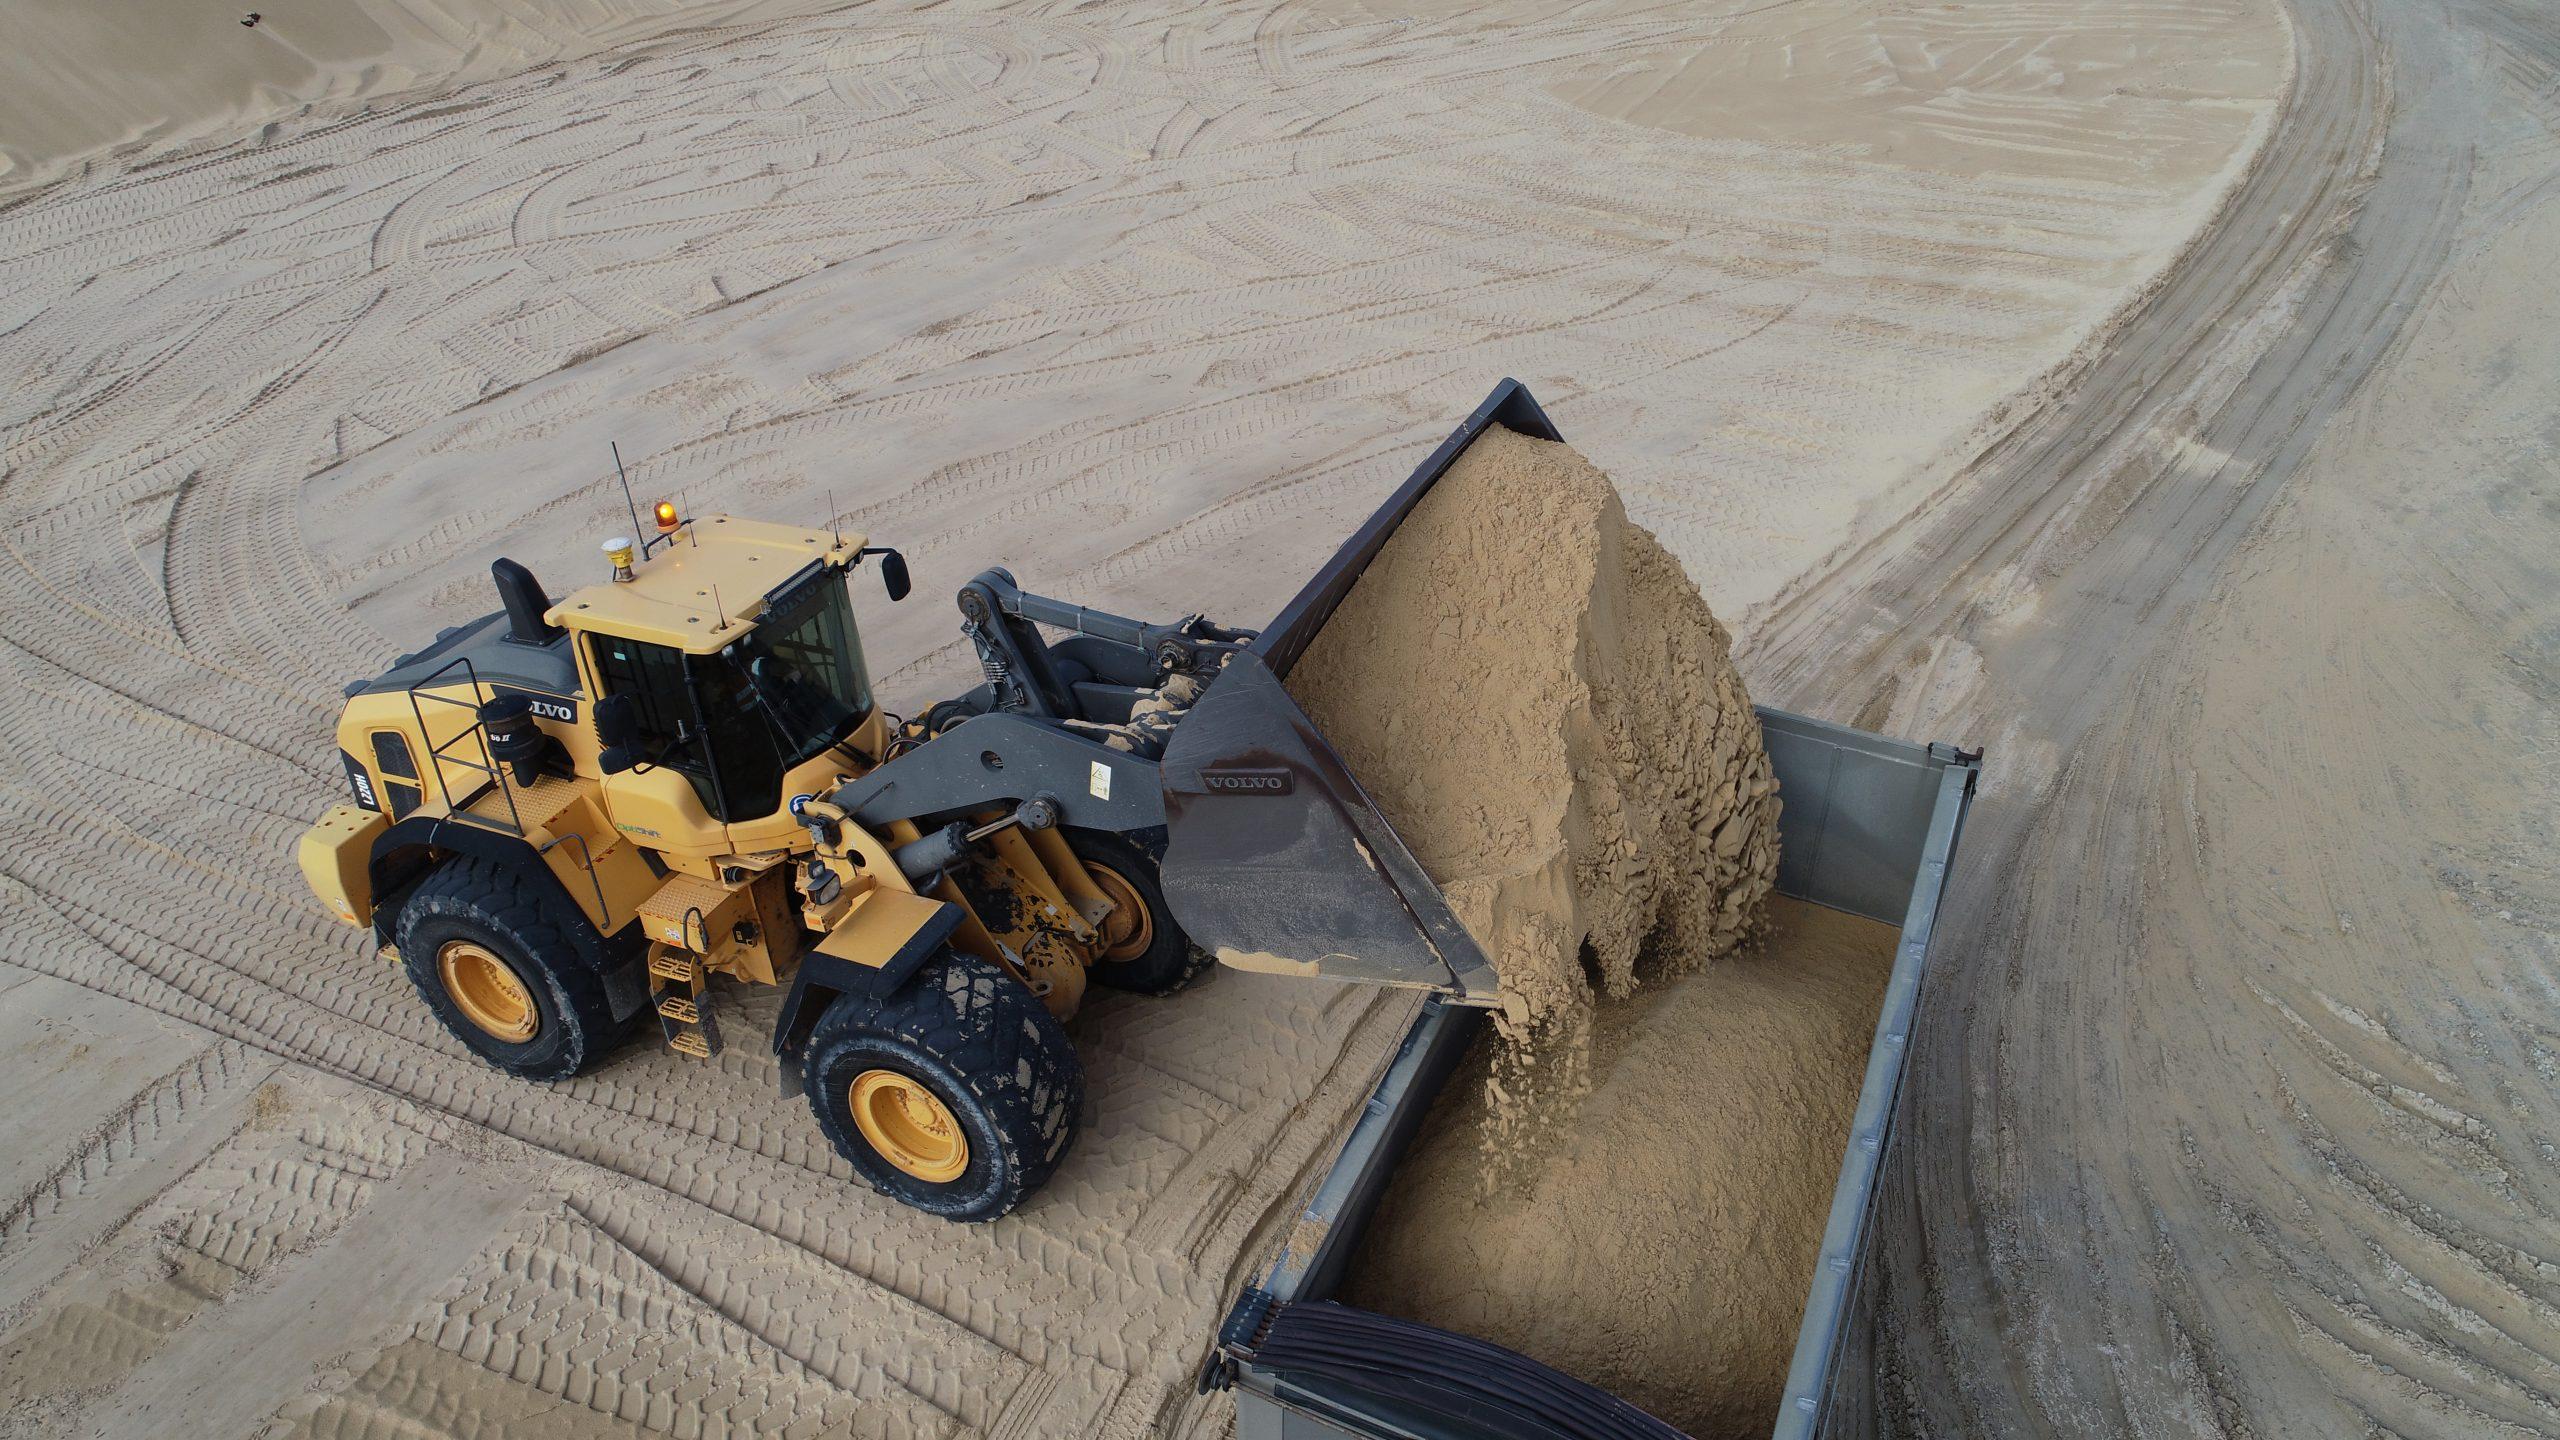 Macka's Sand & Soil Supplies and CJD Equipment 3